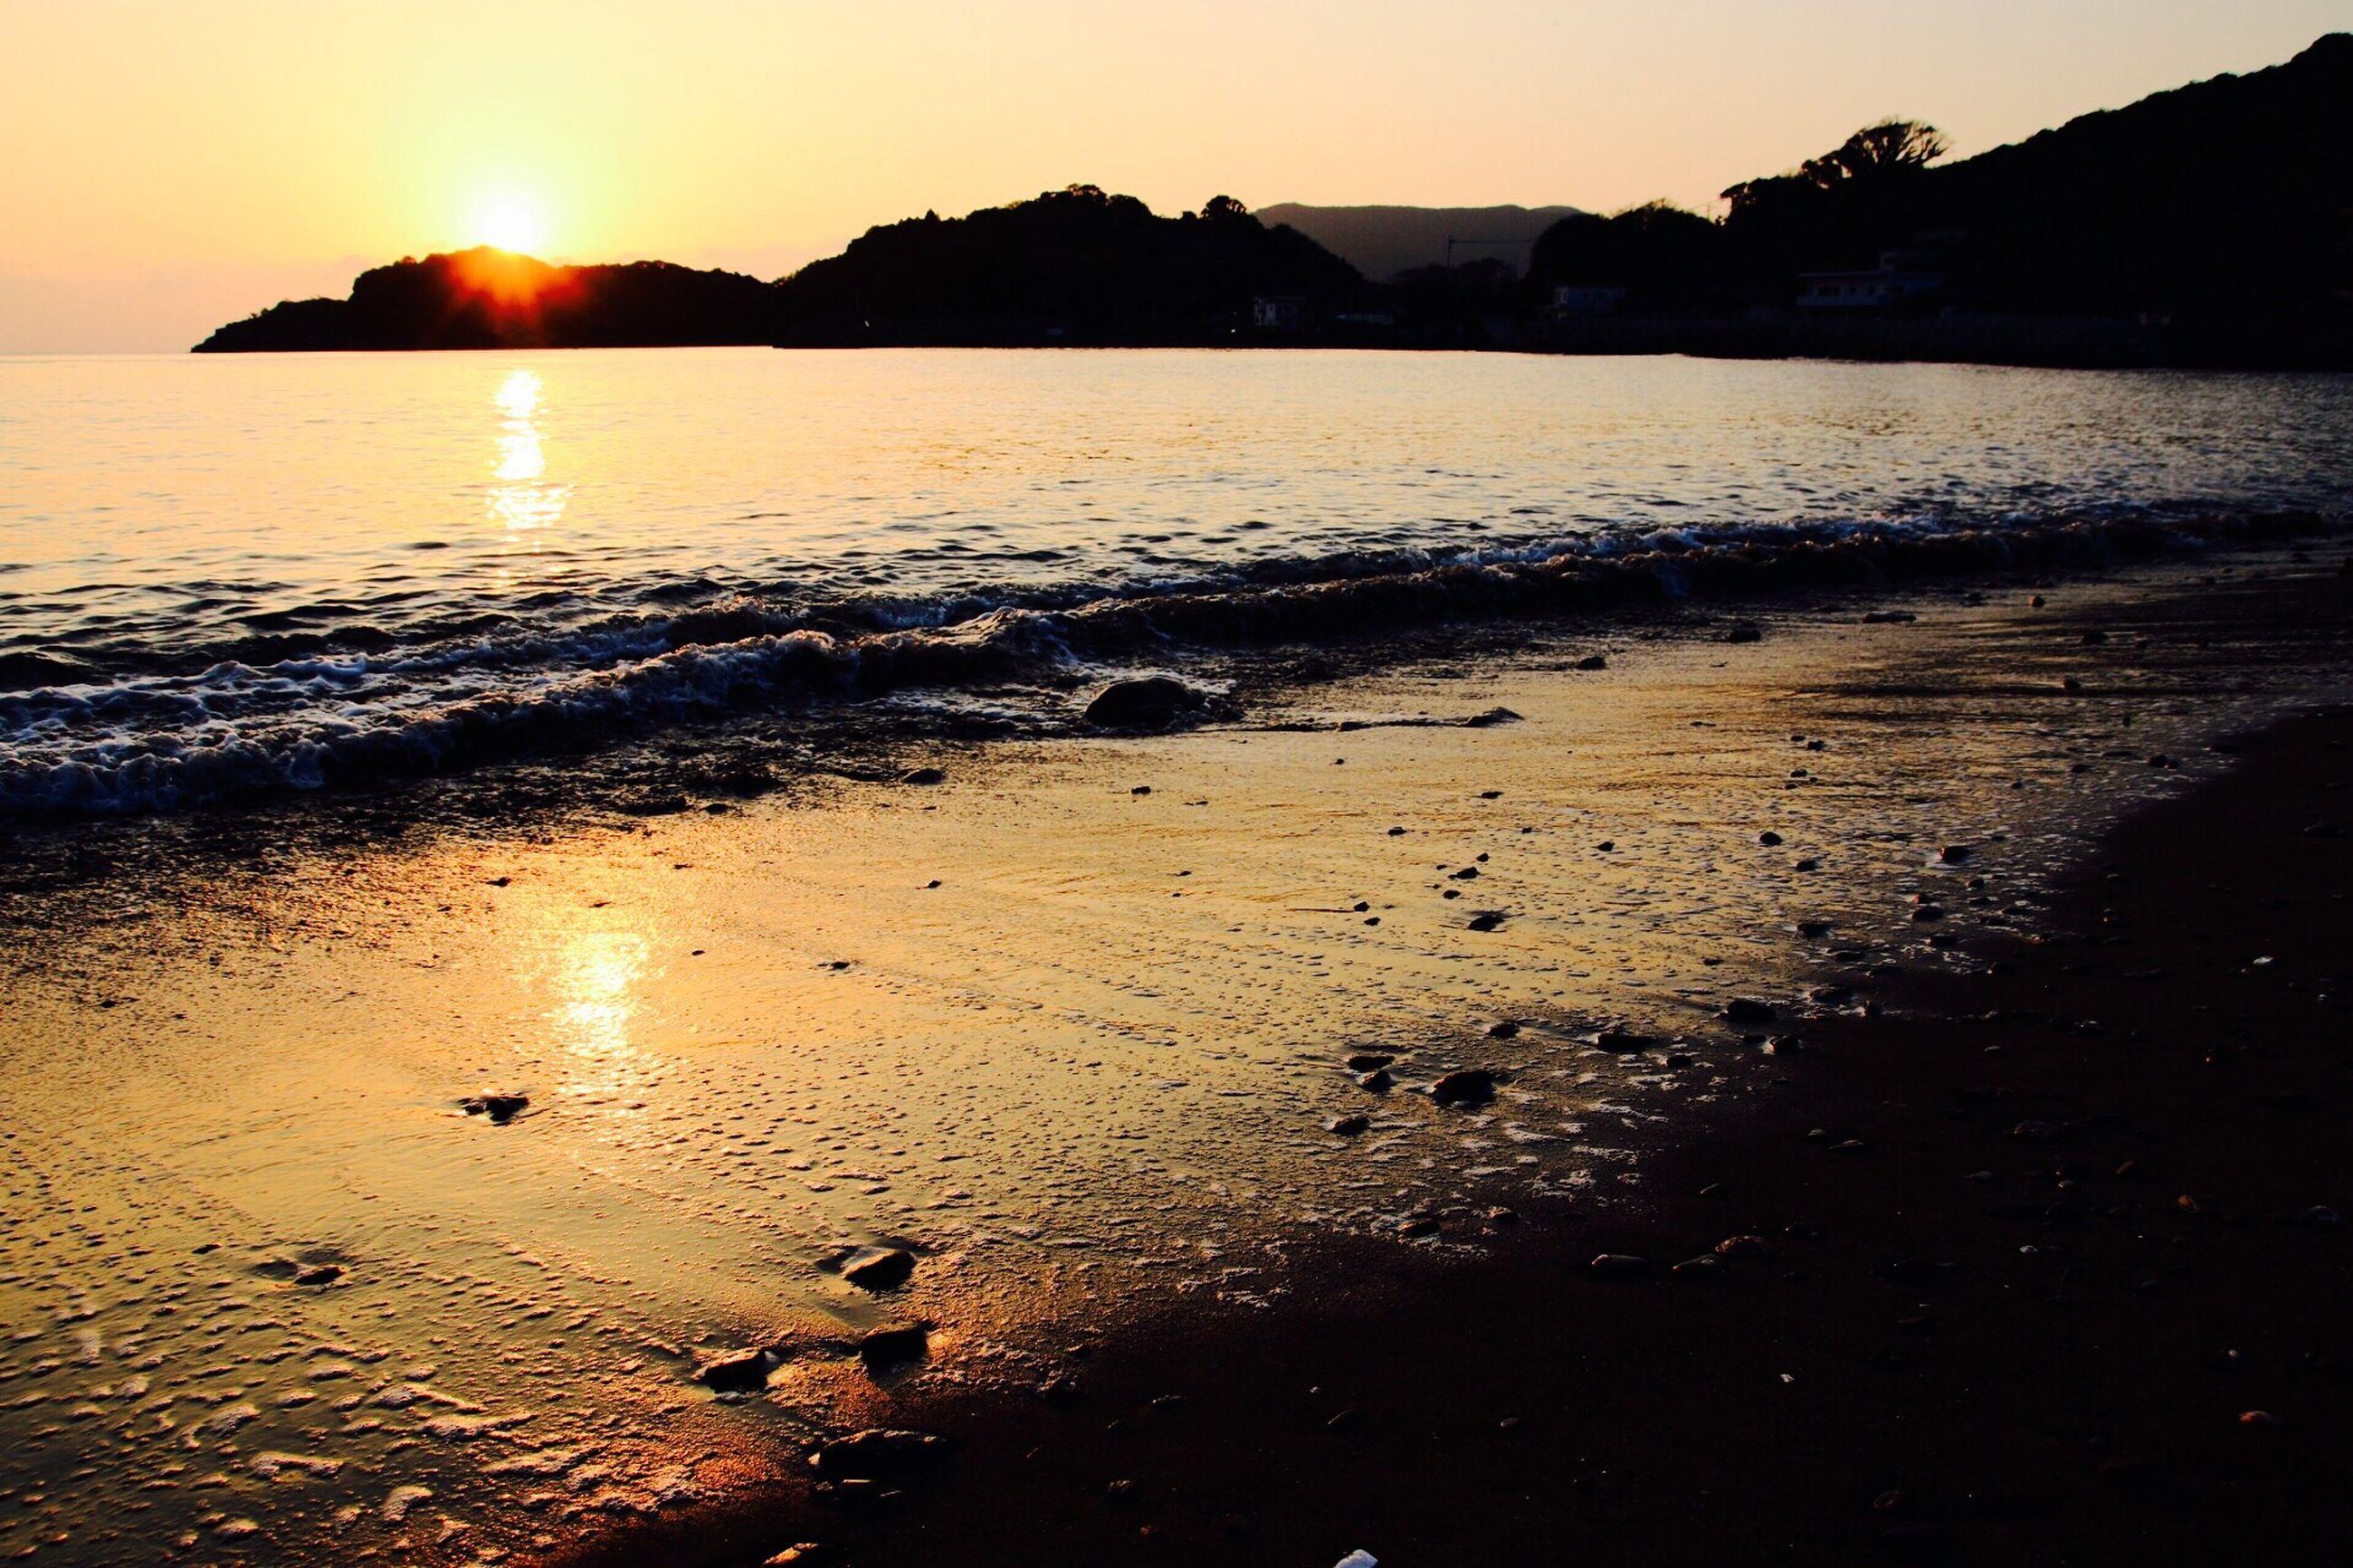 water, sunset, sun, sea, beach, tranquil scene, scenics, tranquility, reflection, shore, beauty in nature, sunlight, sky, nature, idyllic, silhouette, coastline, sunbeam, sand, mountain